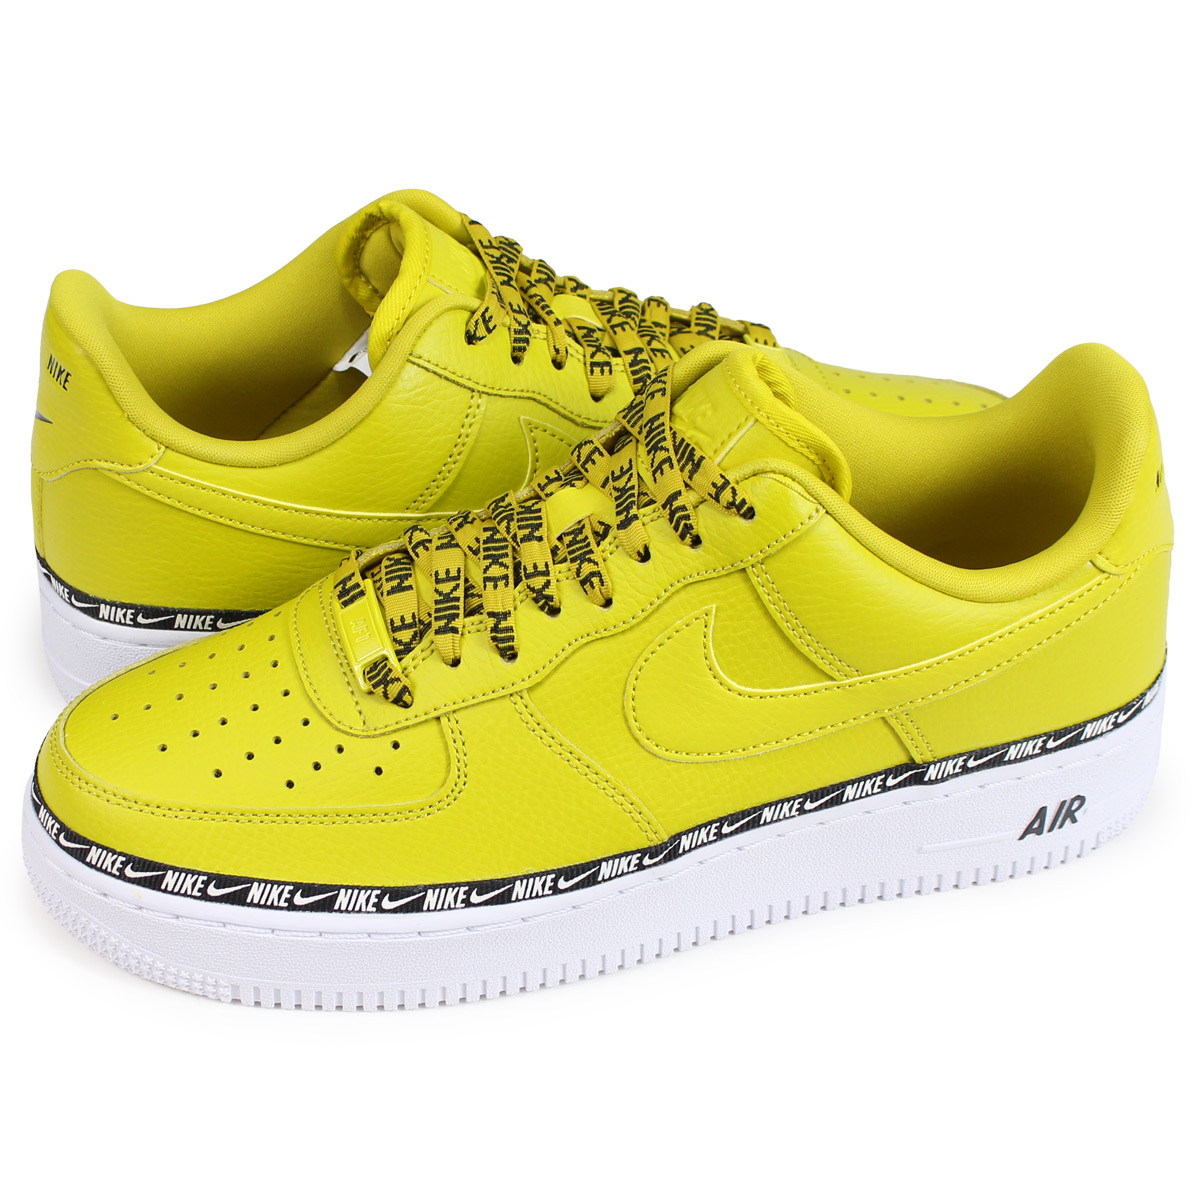 Pour Homme 1 07 Premium Ah6827 Nike Force 700 Air Se Baskets j5A4RL